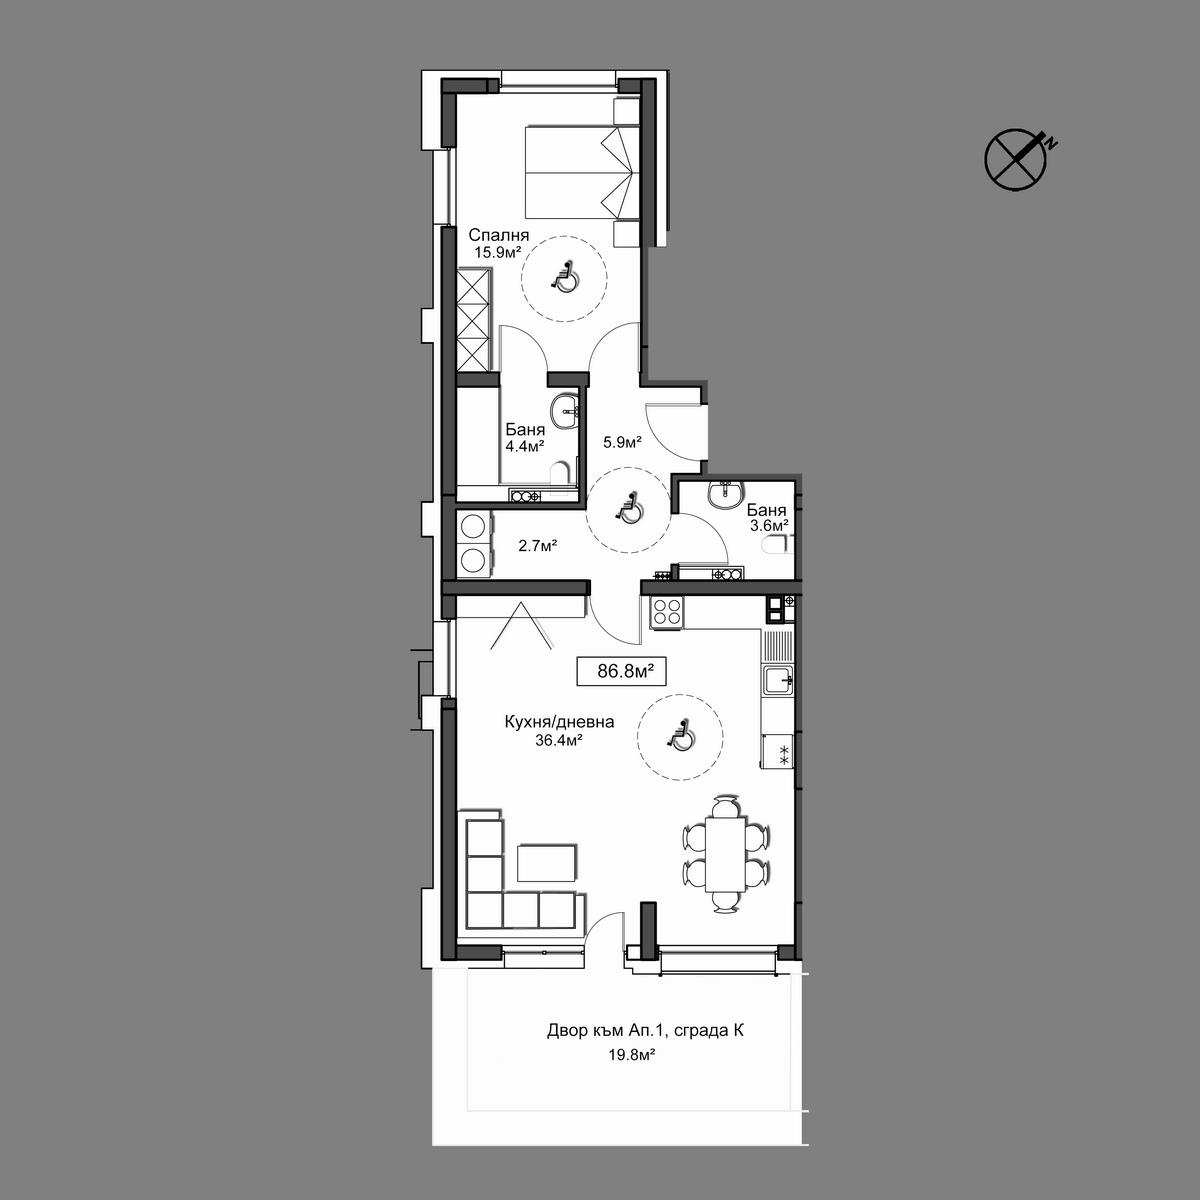 Продава апартамент ново строителство - Апартамент 1